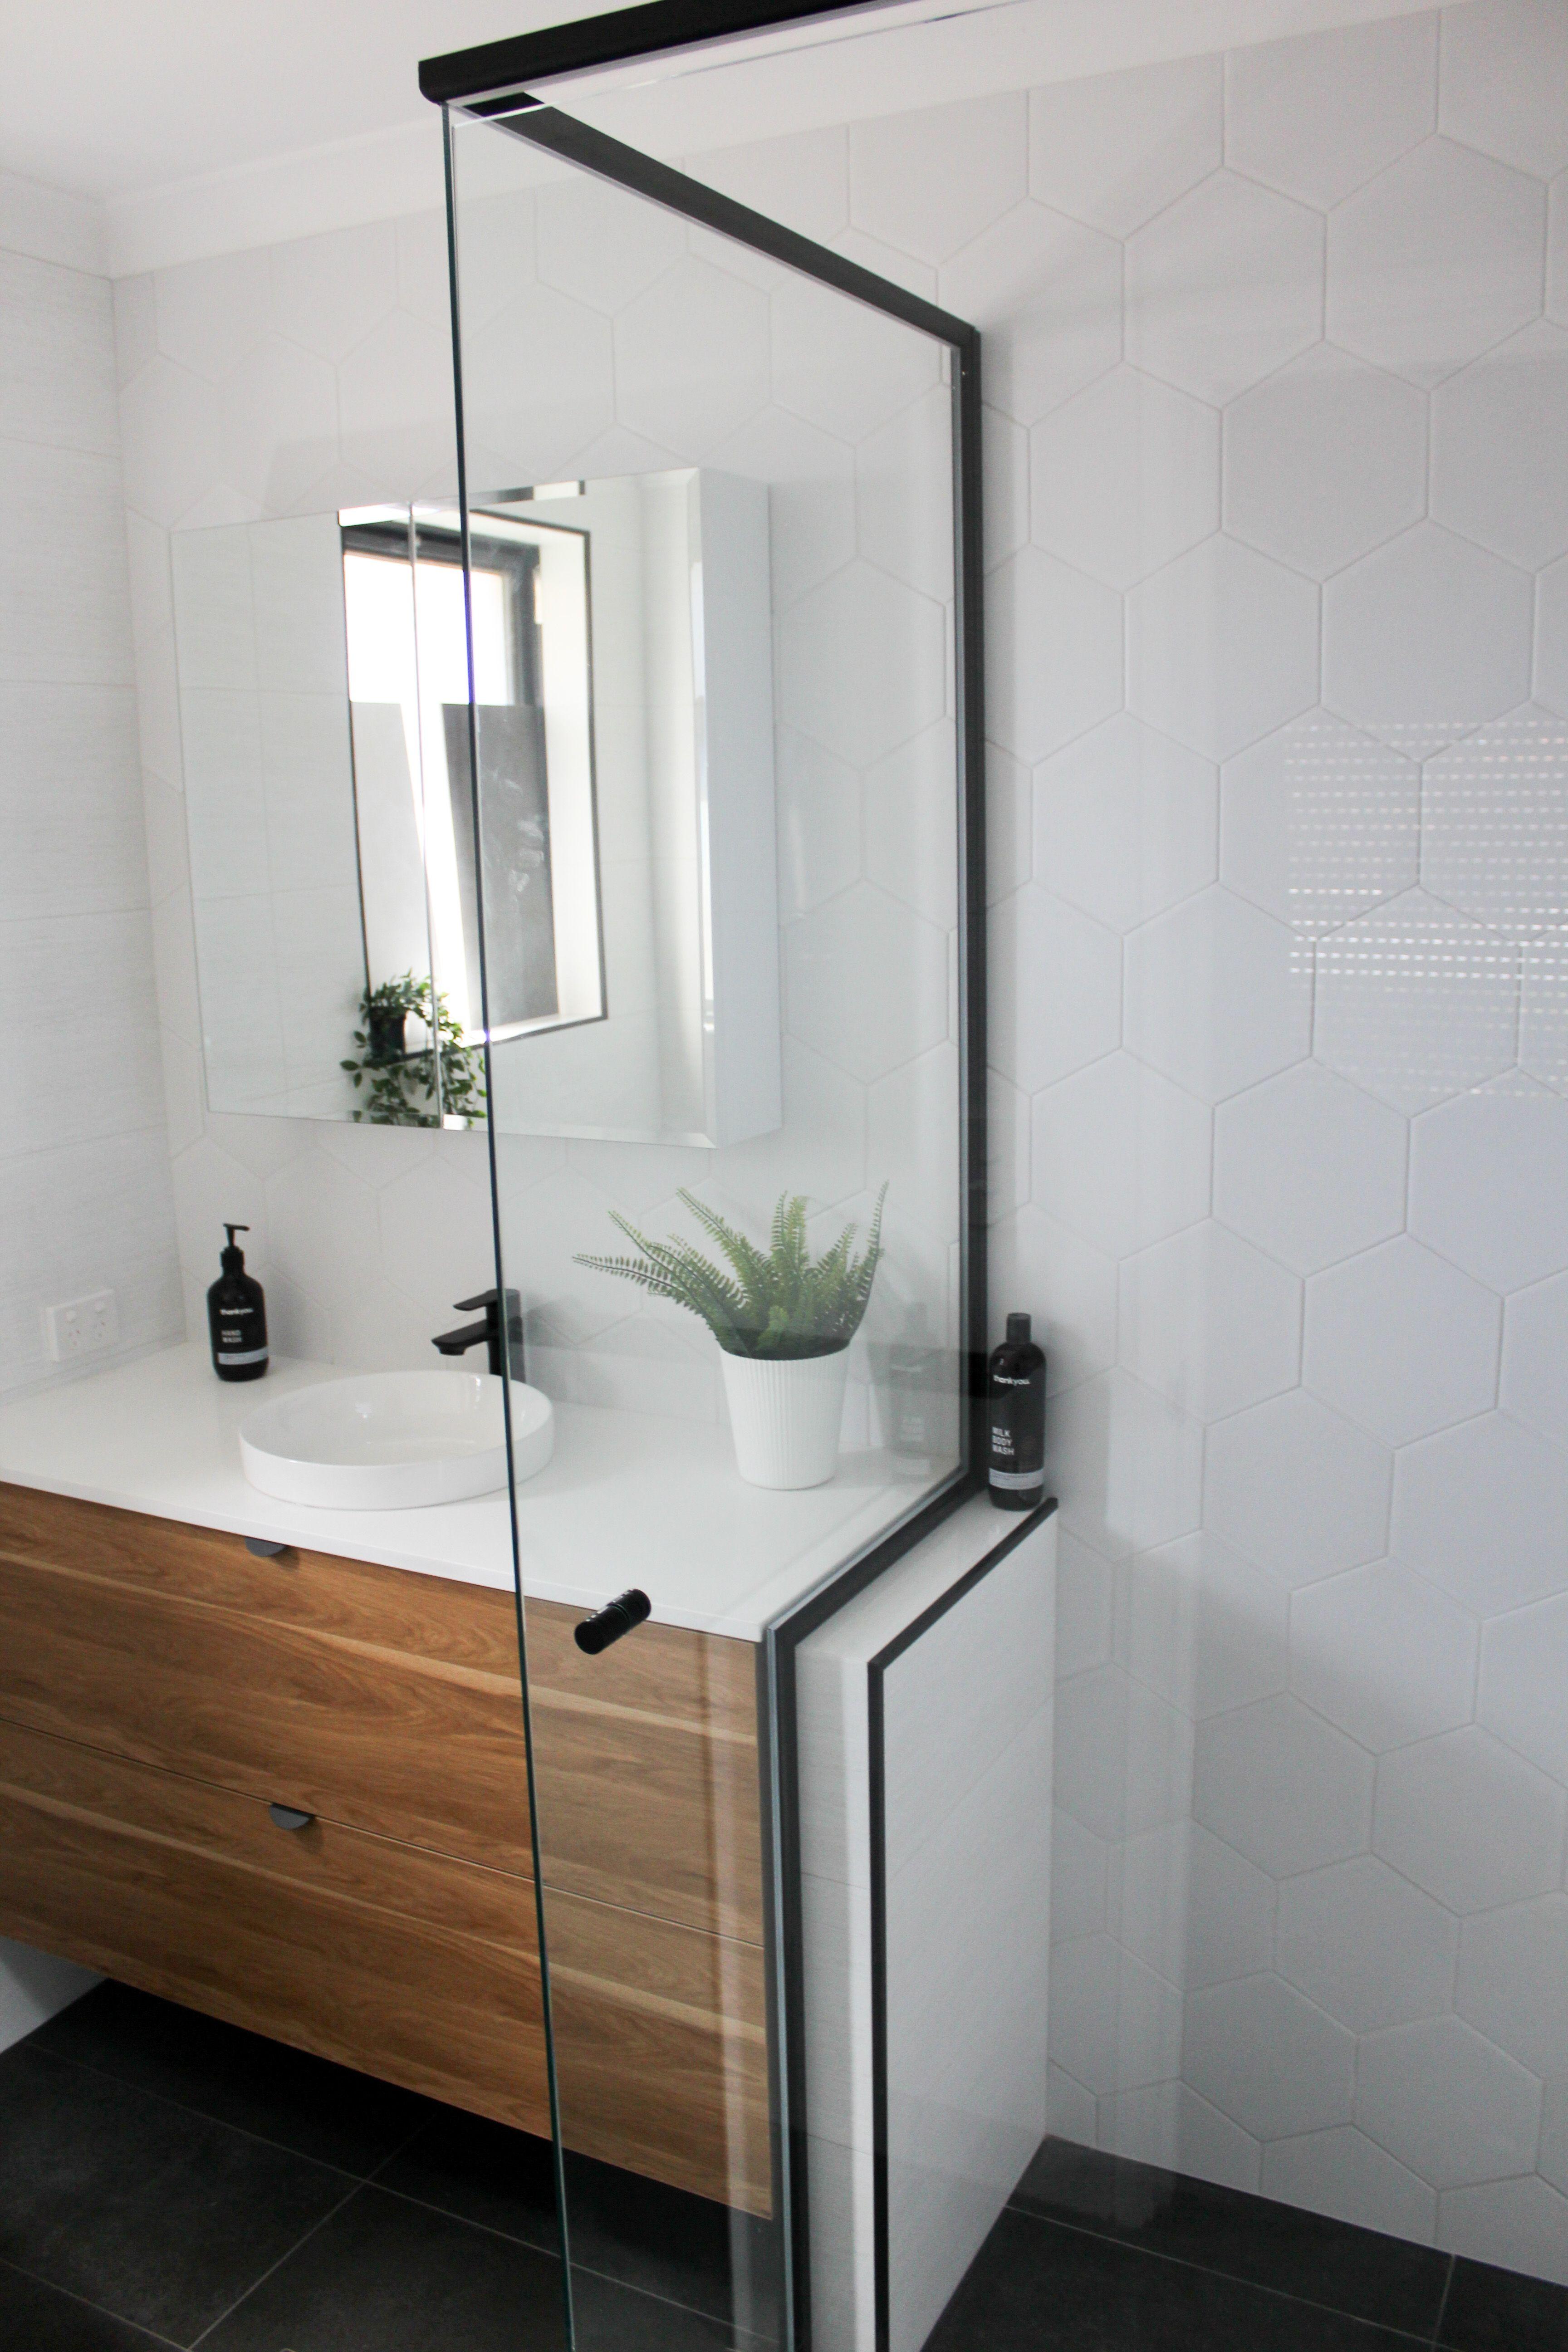 Black Trim Shower Screen Ensuite Bathroom Designs Shower Screen Bathroom Wall Hanging